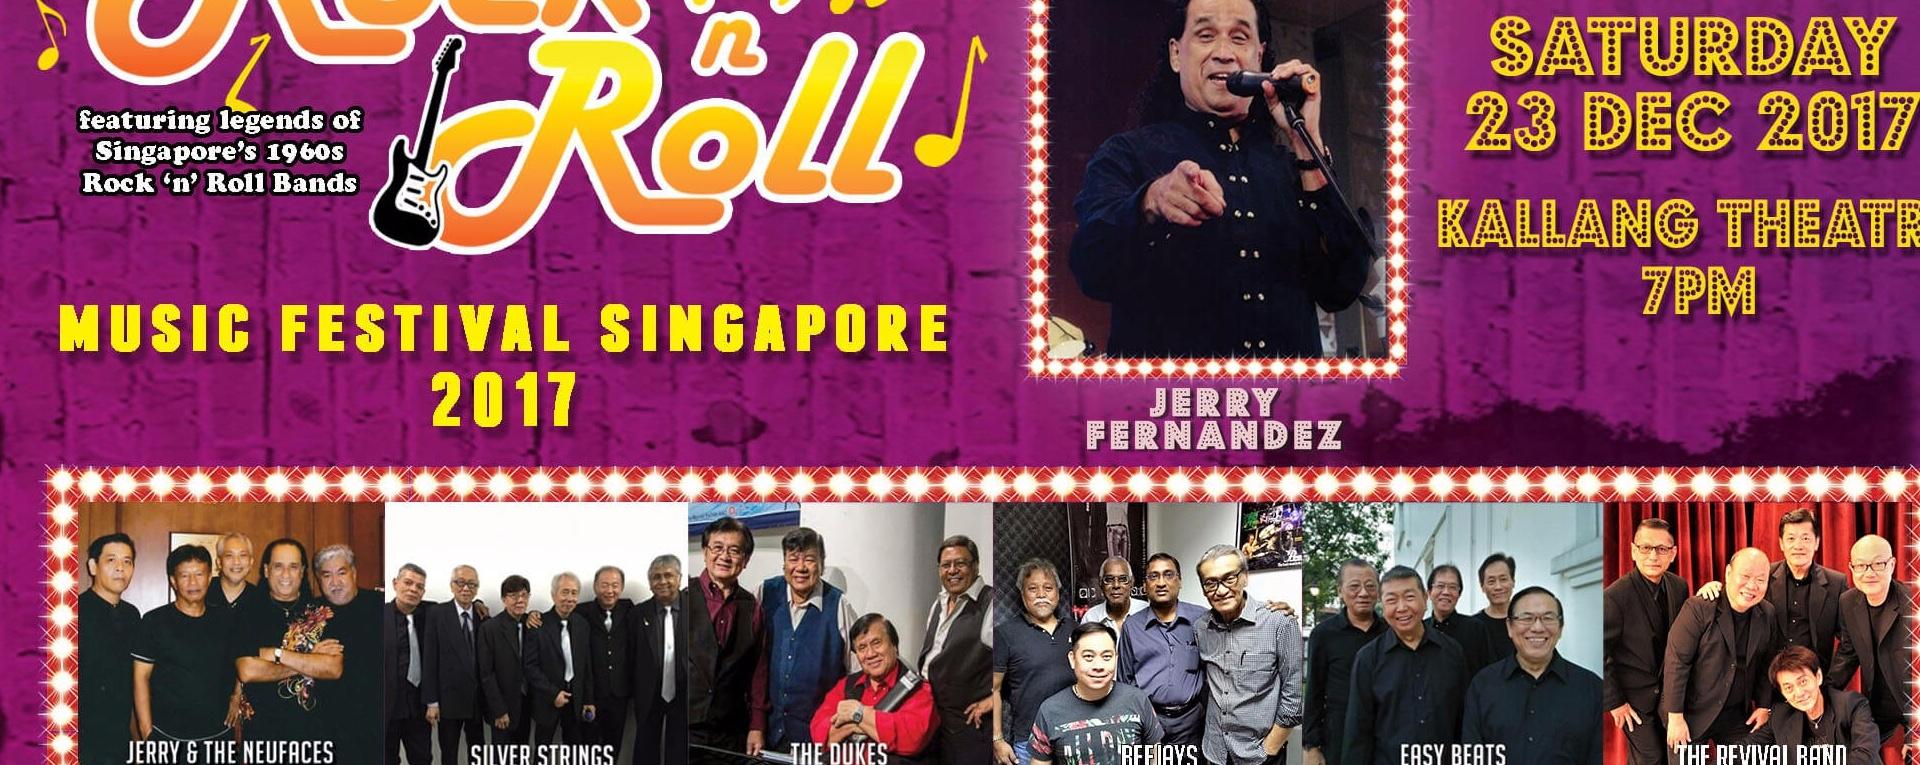 Rock 'N' Roll Music Festival Singapore 2017